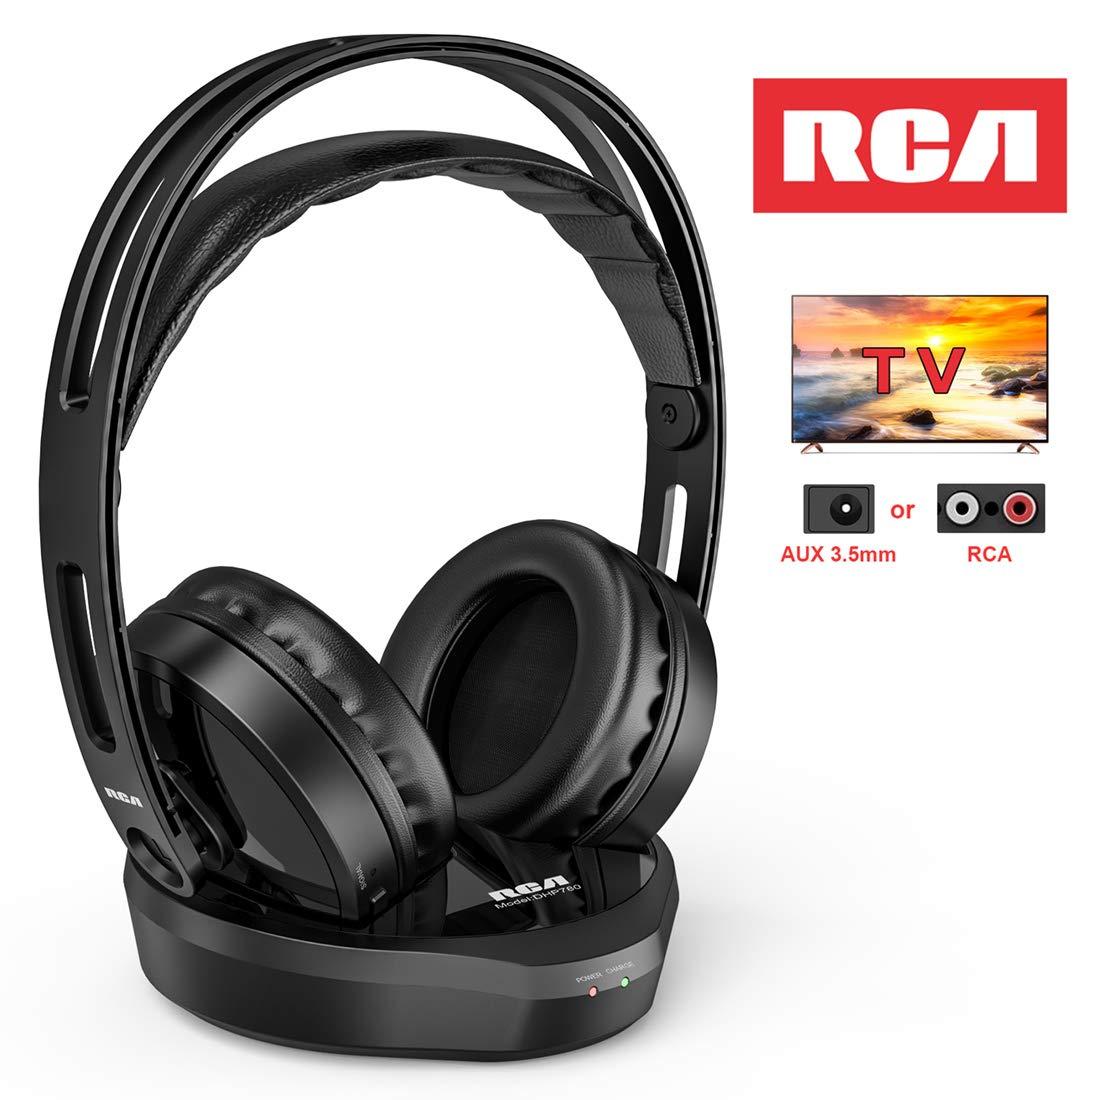 Wireless Headphones RCA Transmitter Rechargeable